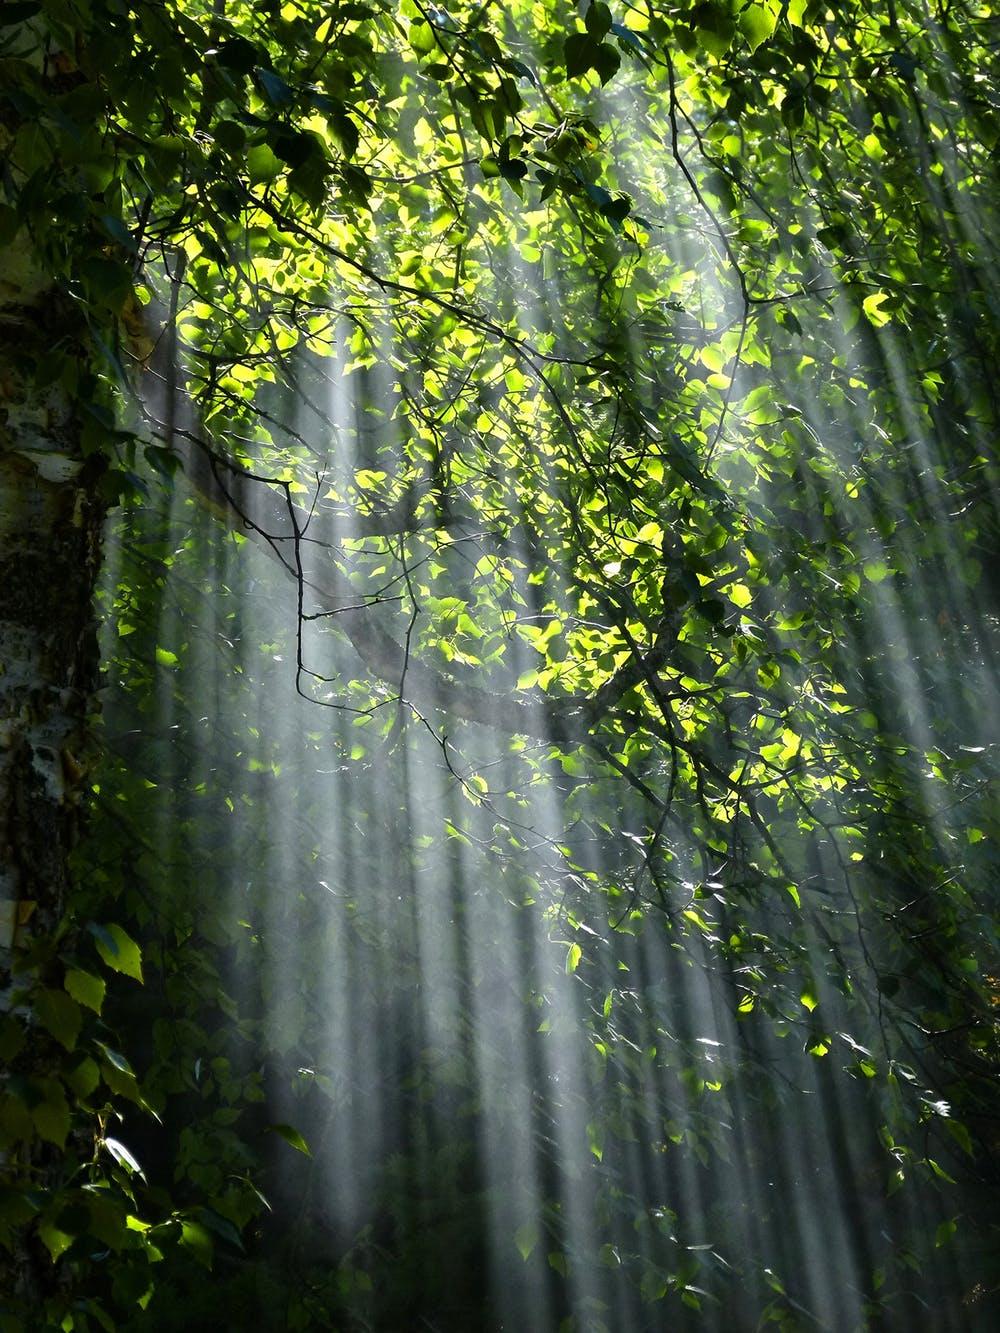 forest-sunbeams-trees-sunlight-70365.jpg